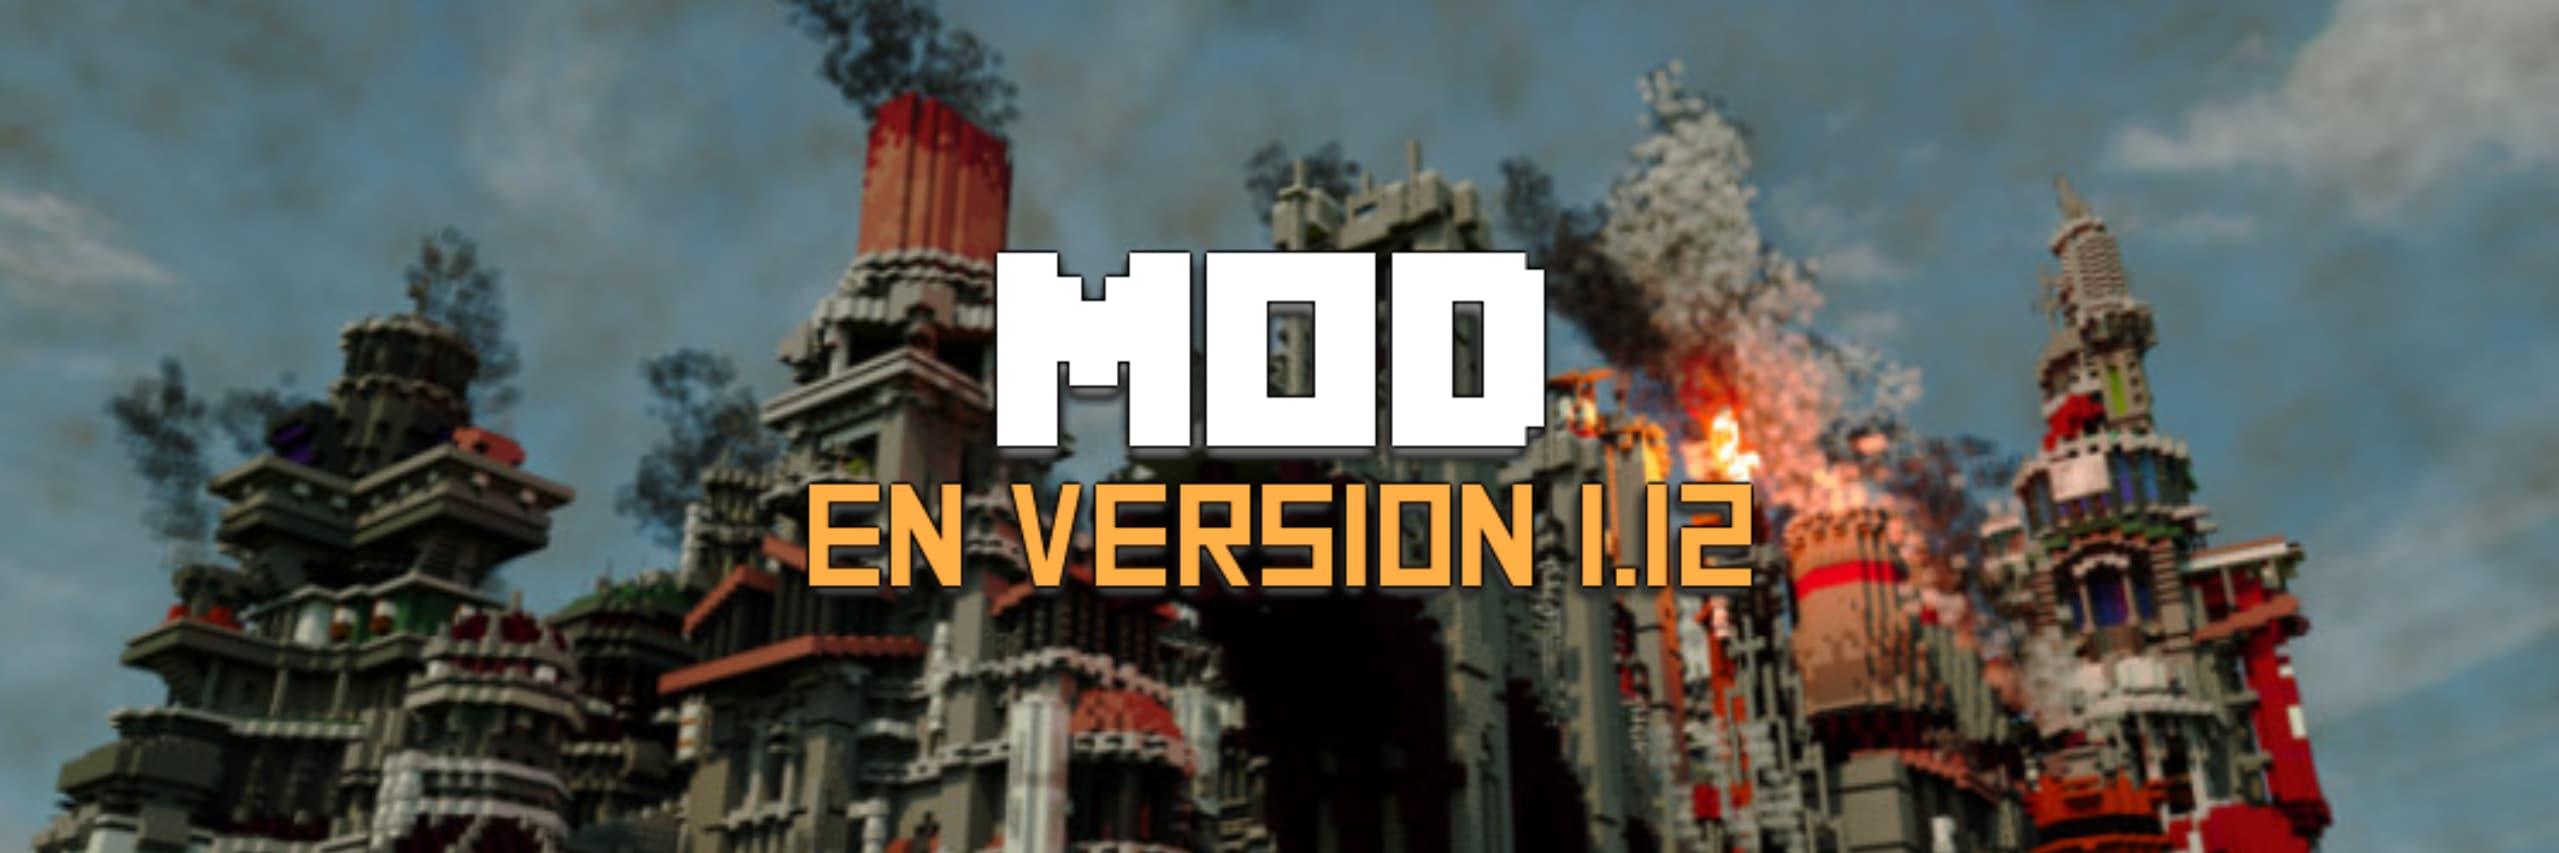 mod minecraft 1.12.2